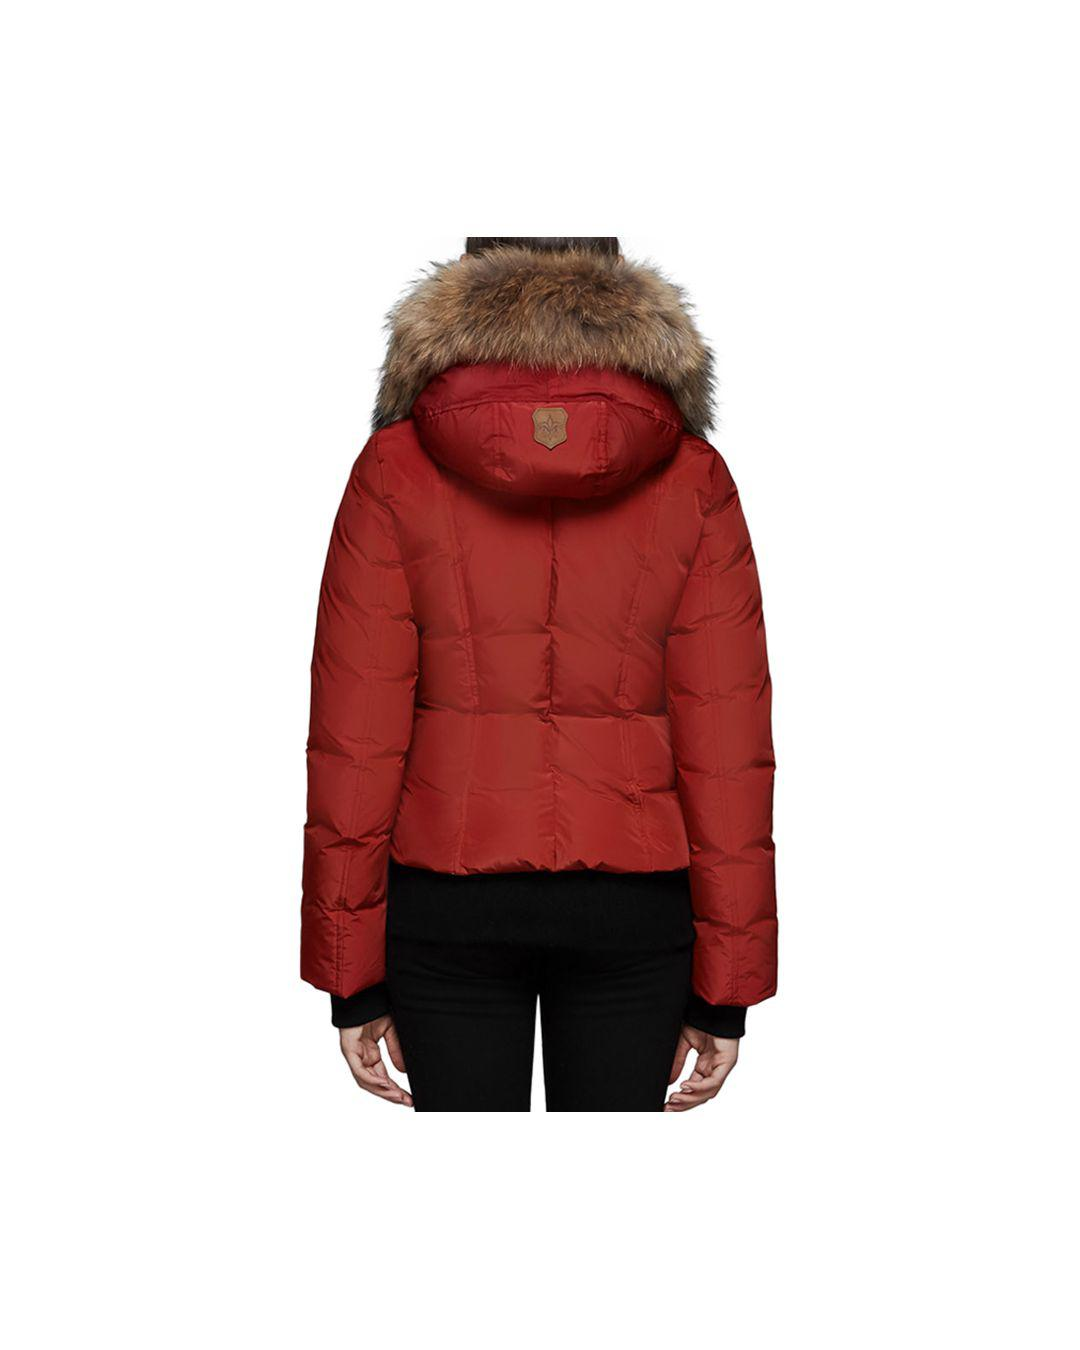 0f53b4cc90ea7 Lyst - Mackage Romane Fur Trim Down Bomber Jacket in Red - Save 30%